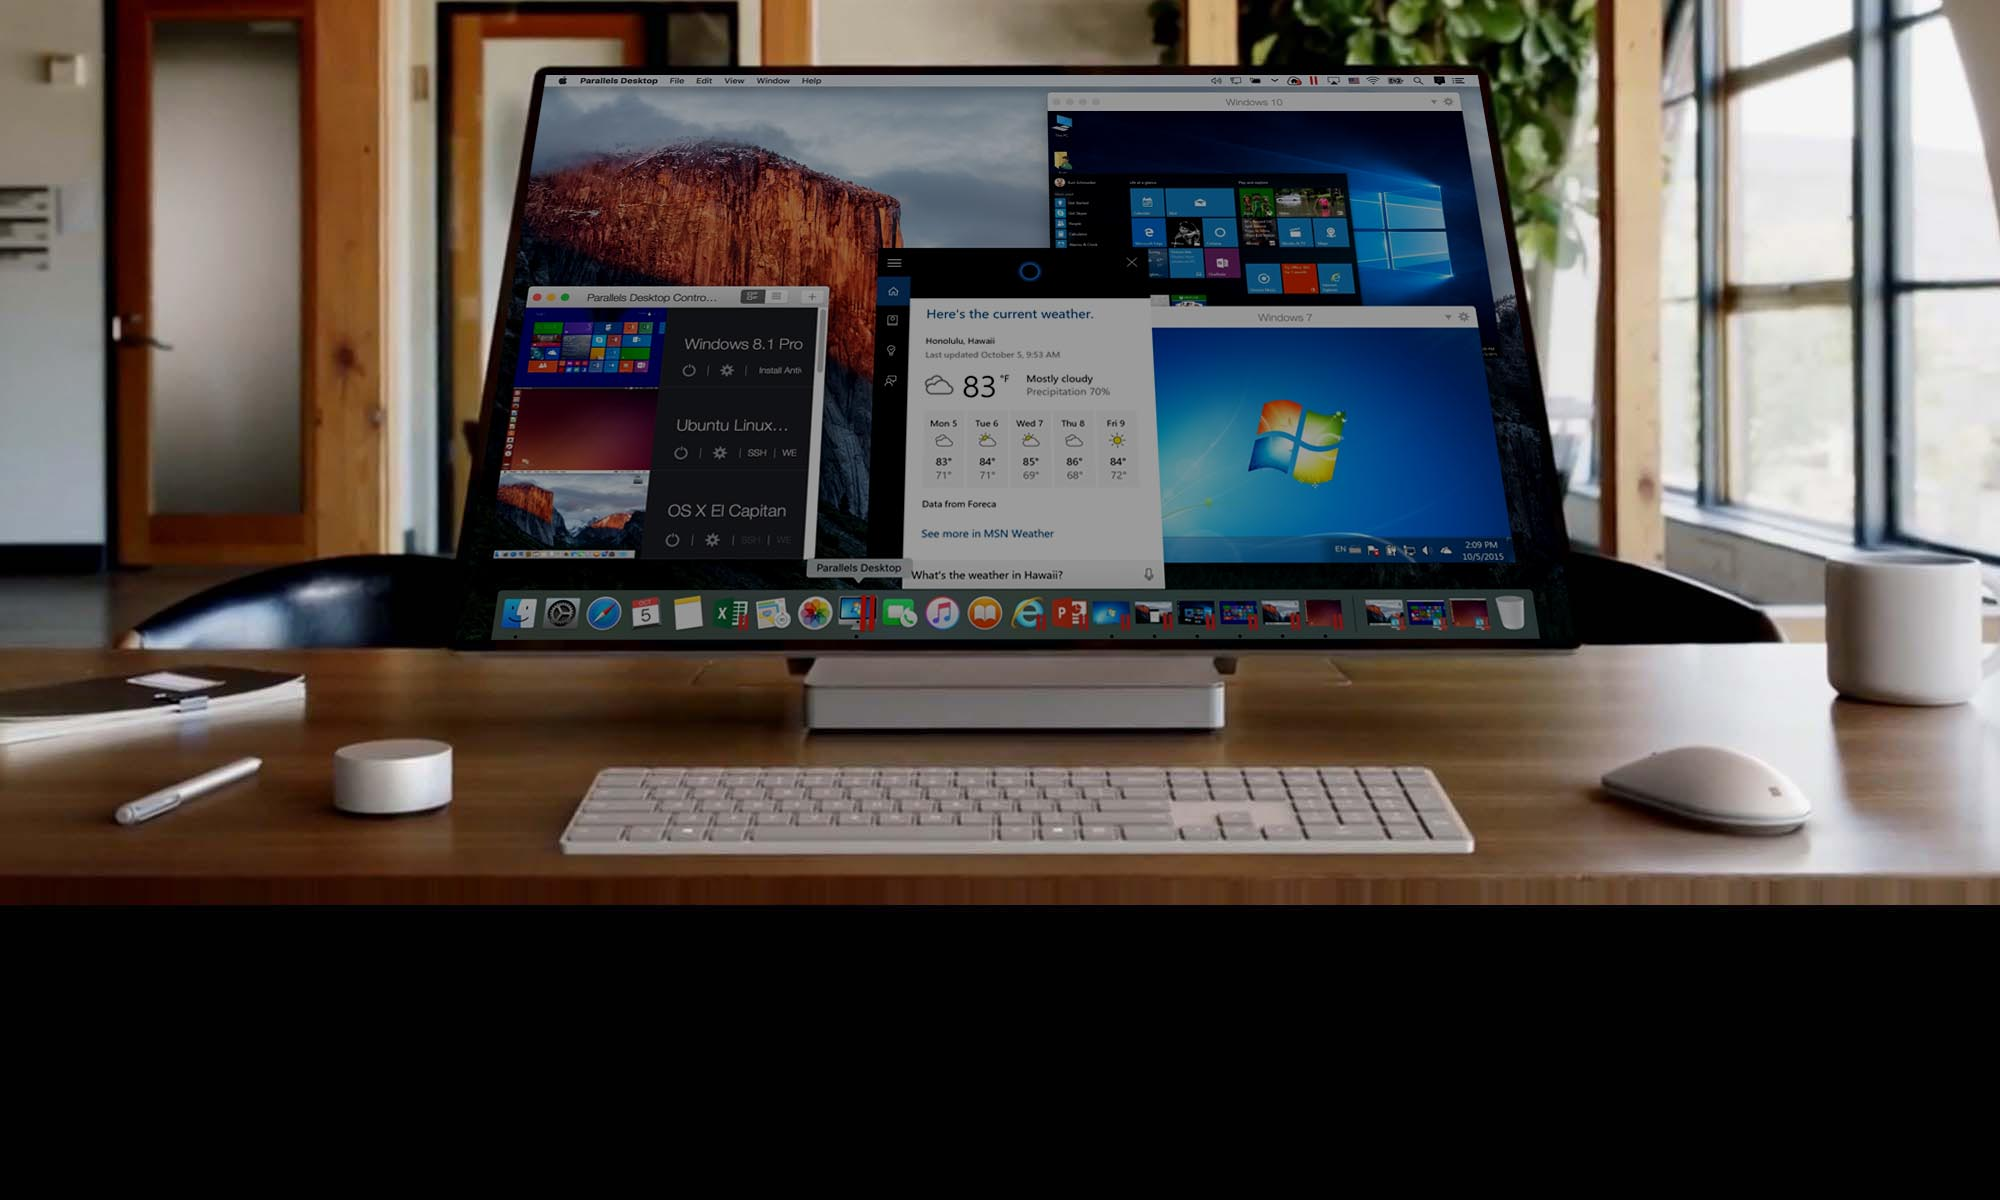 PC Hardware & Software